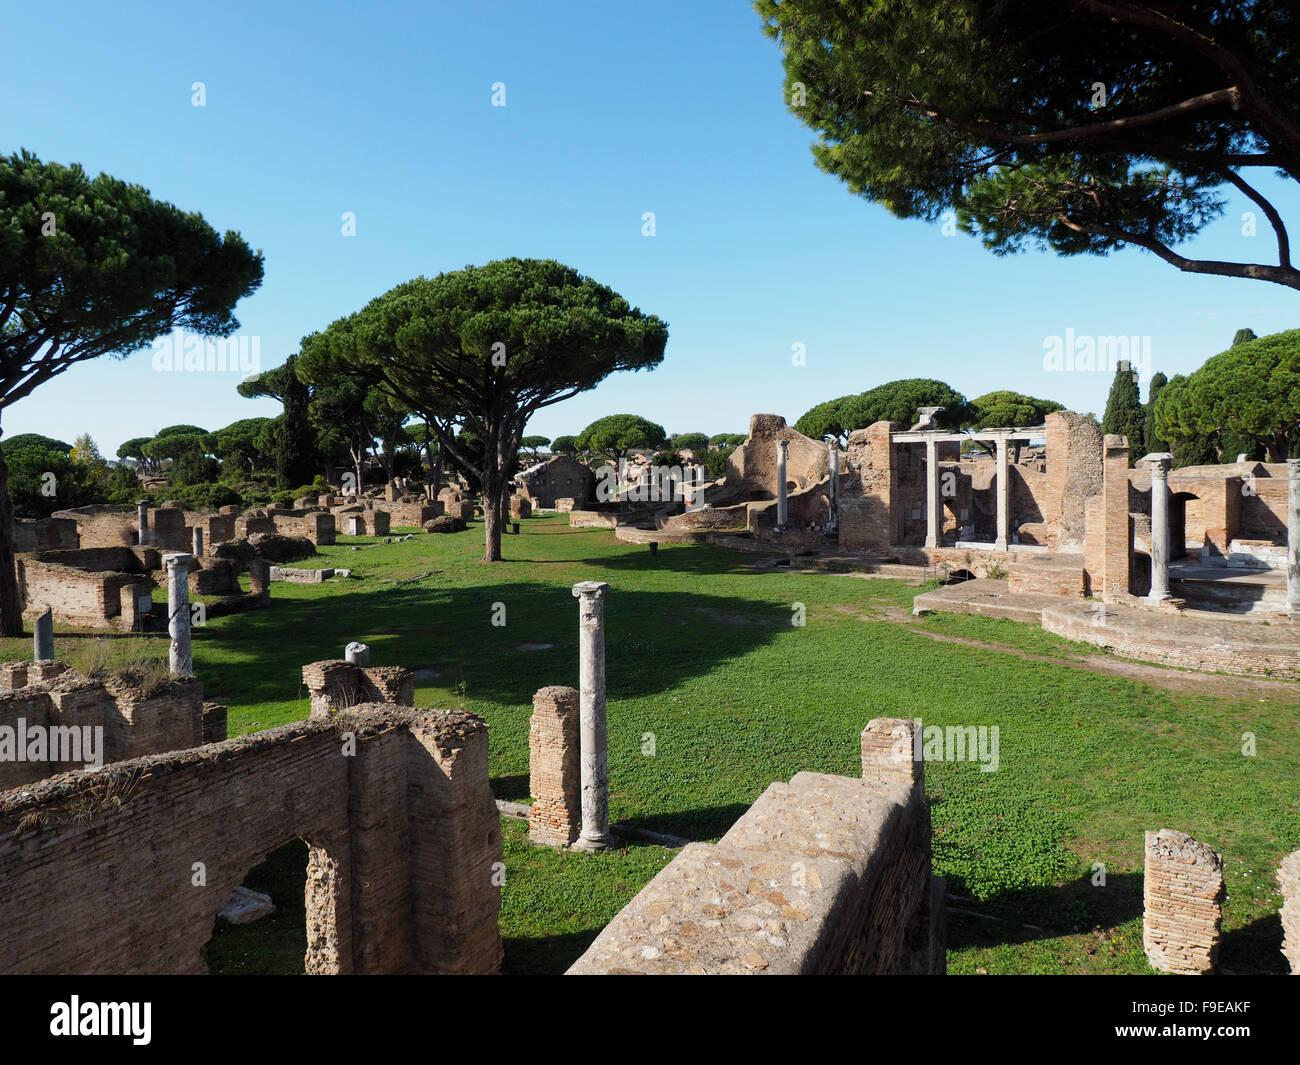 Ostia Antica excavation site near Rome, Italy - Stock Image